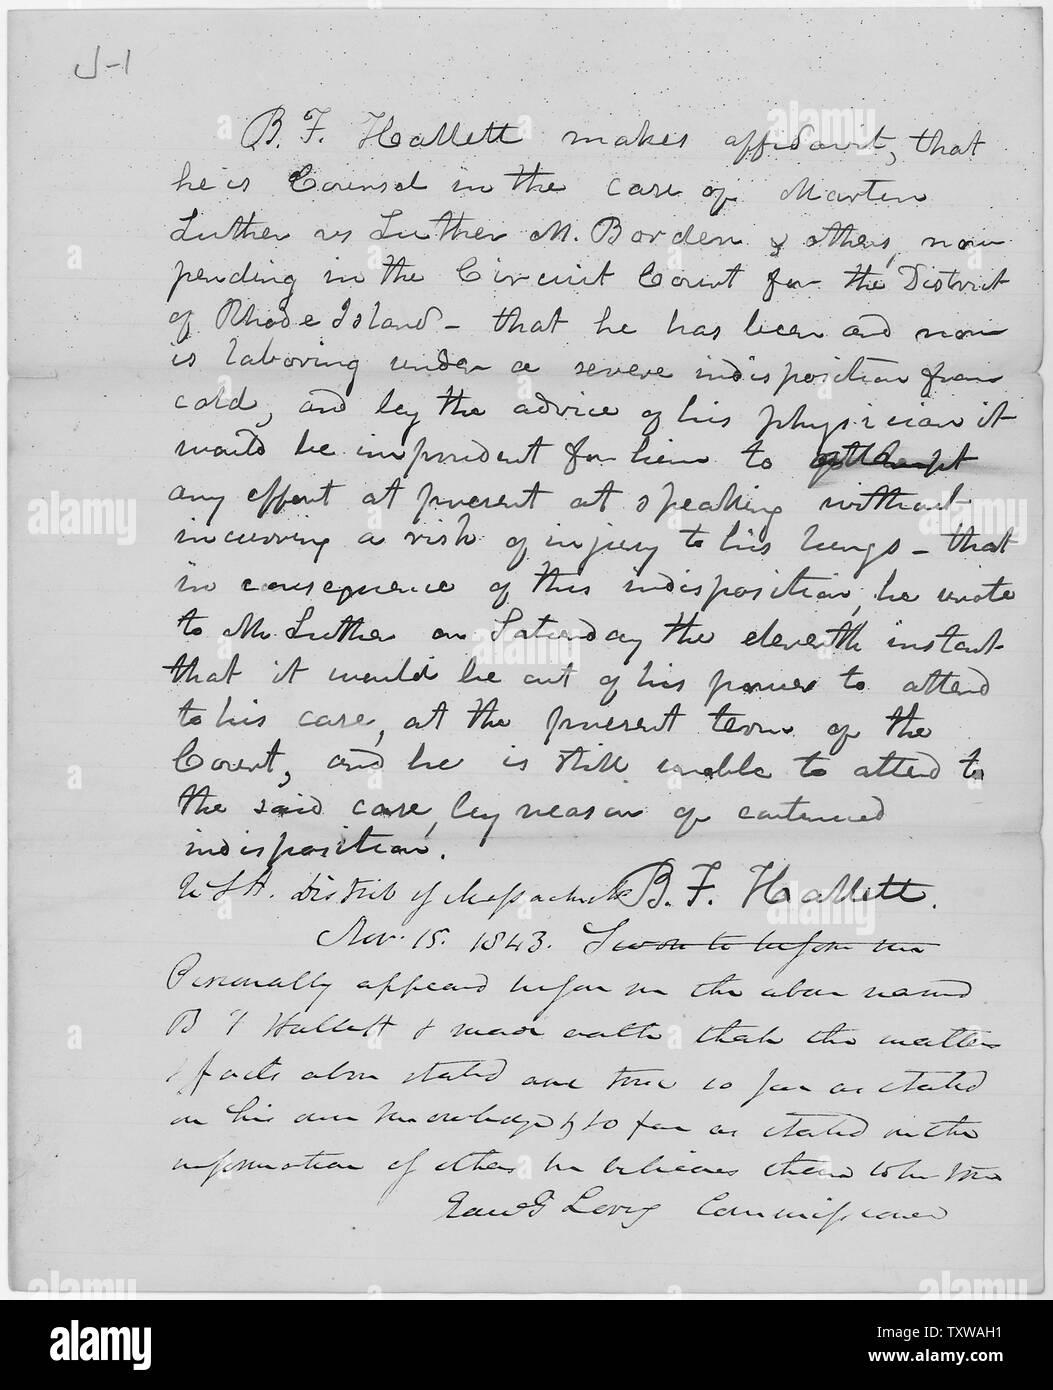 Affidavit of B F  Hallett in the case of Martin Luther v